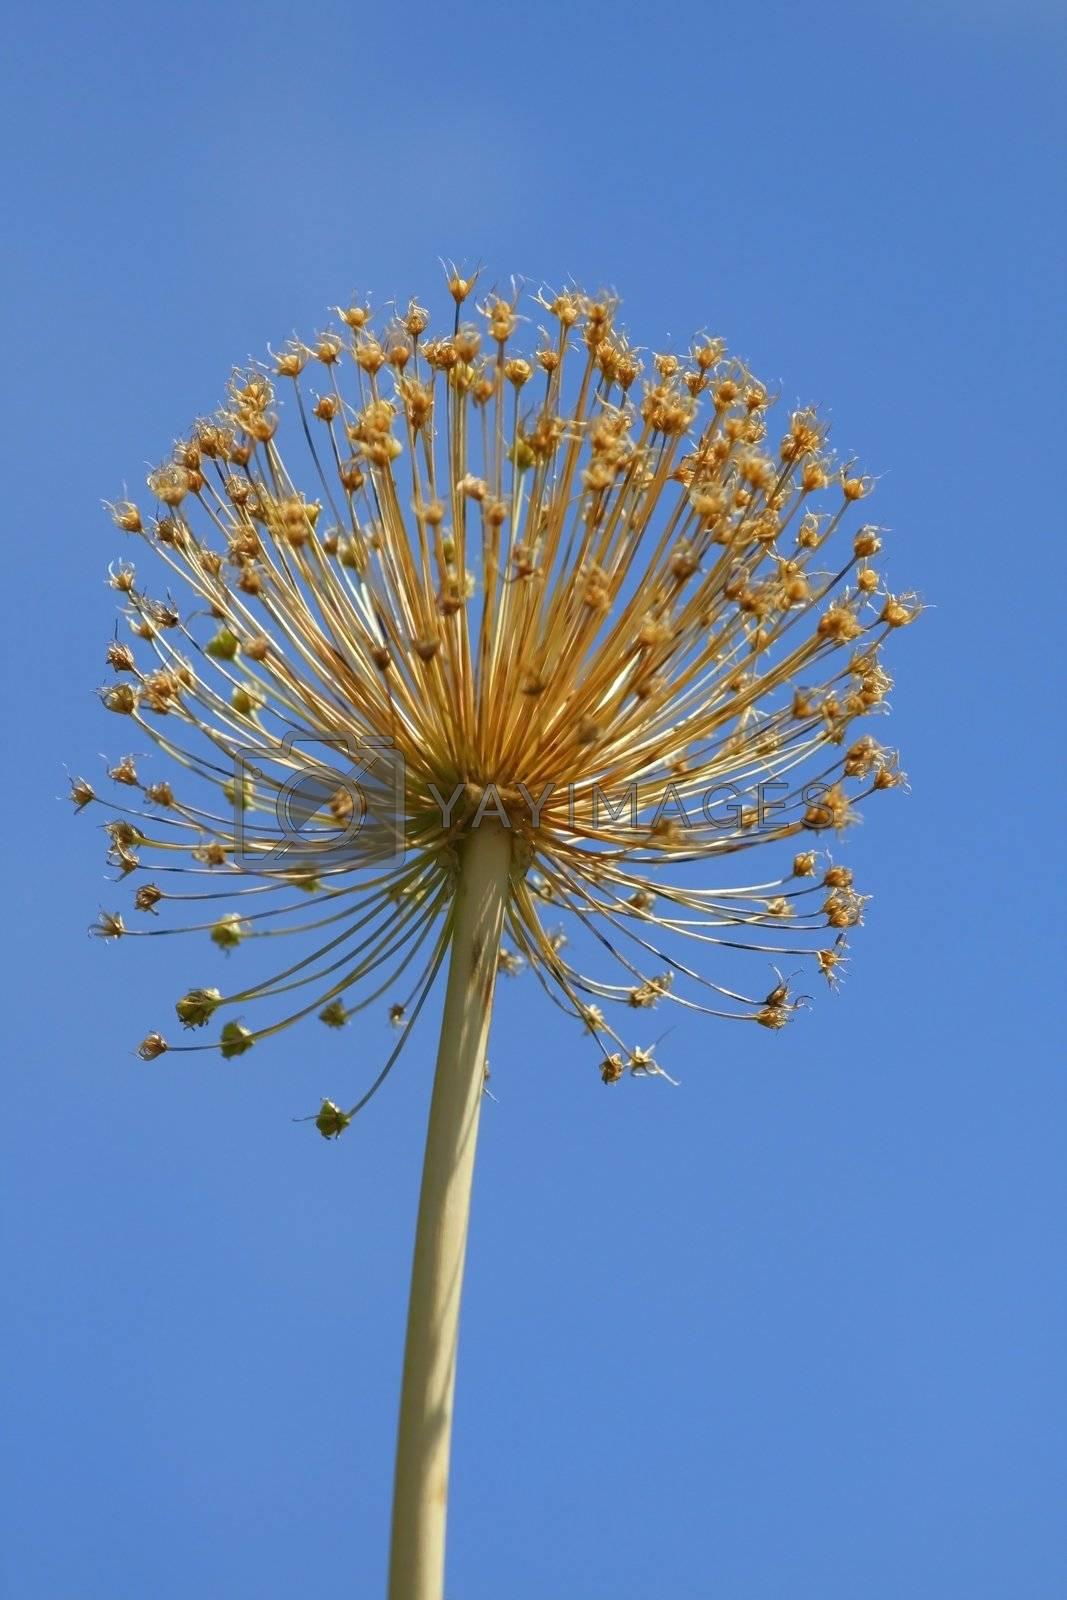 Large Wild Flower by snehit